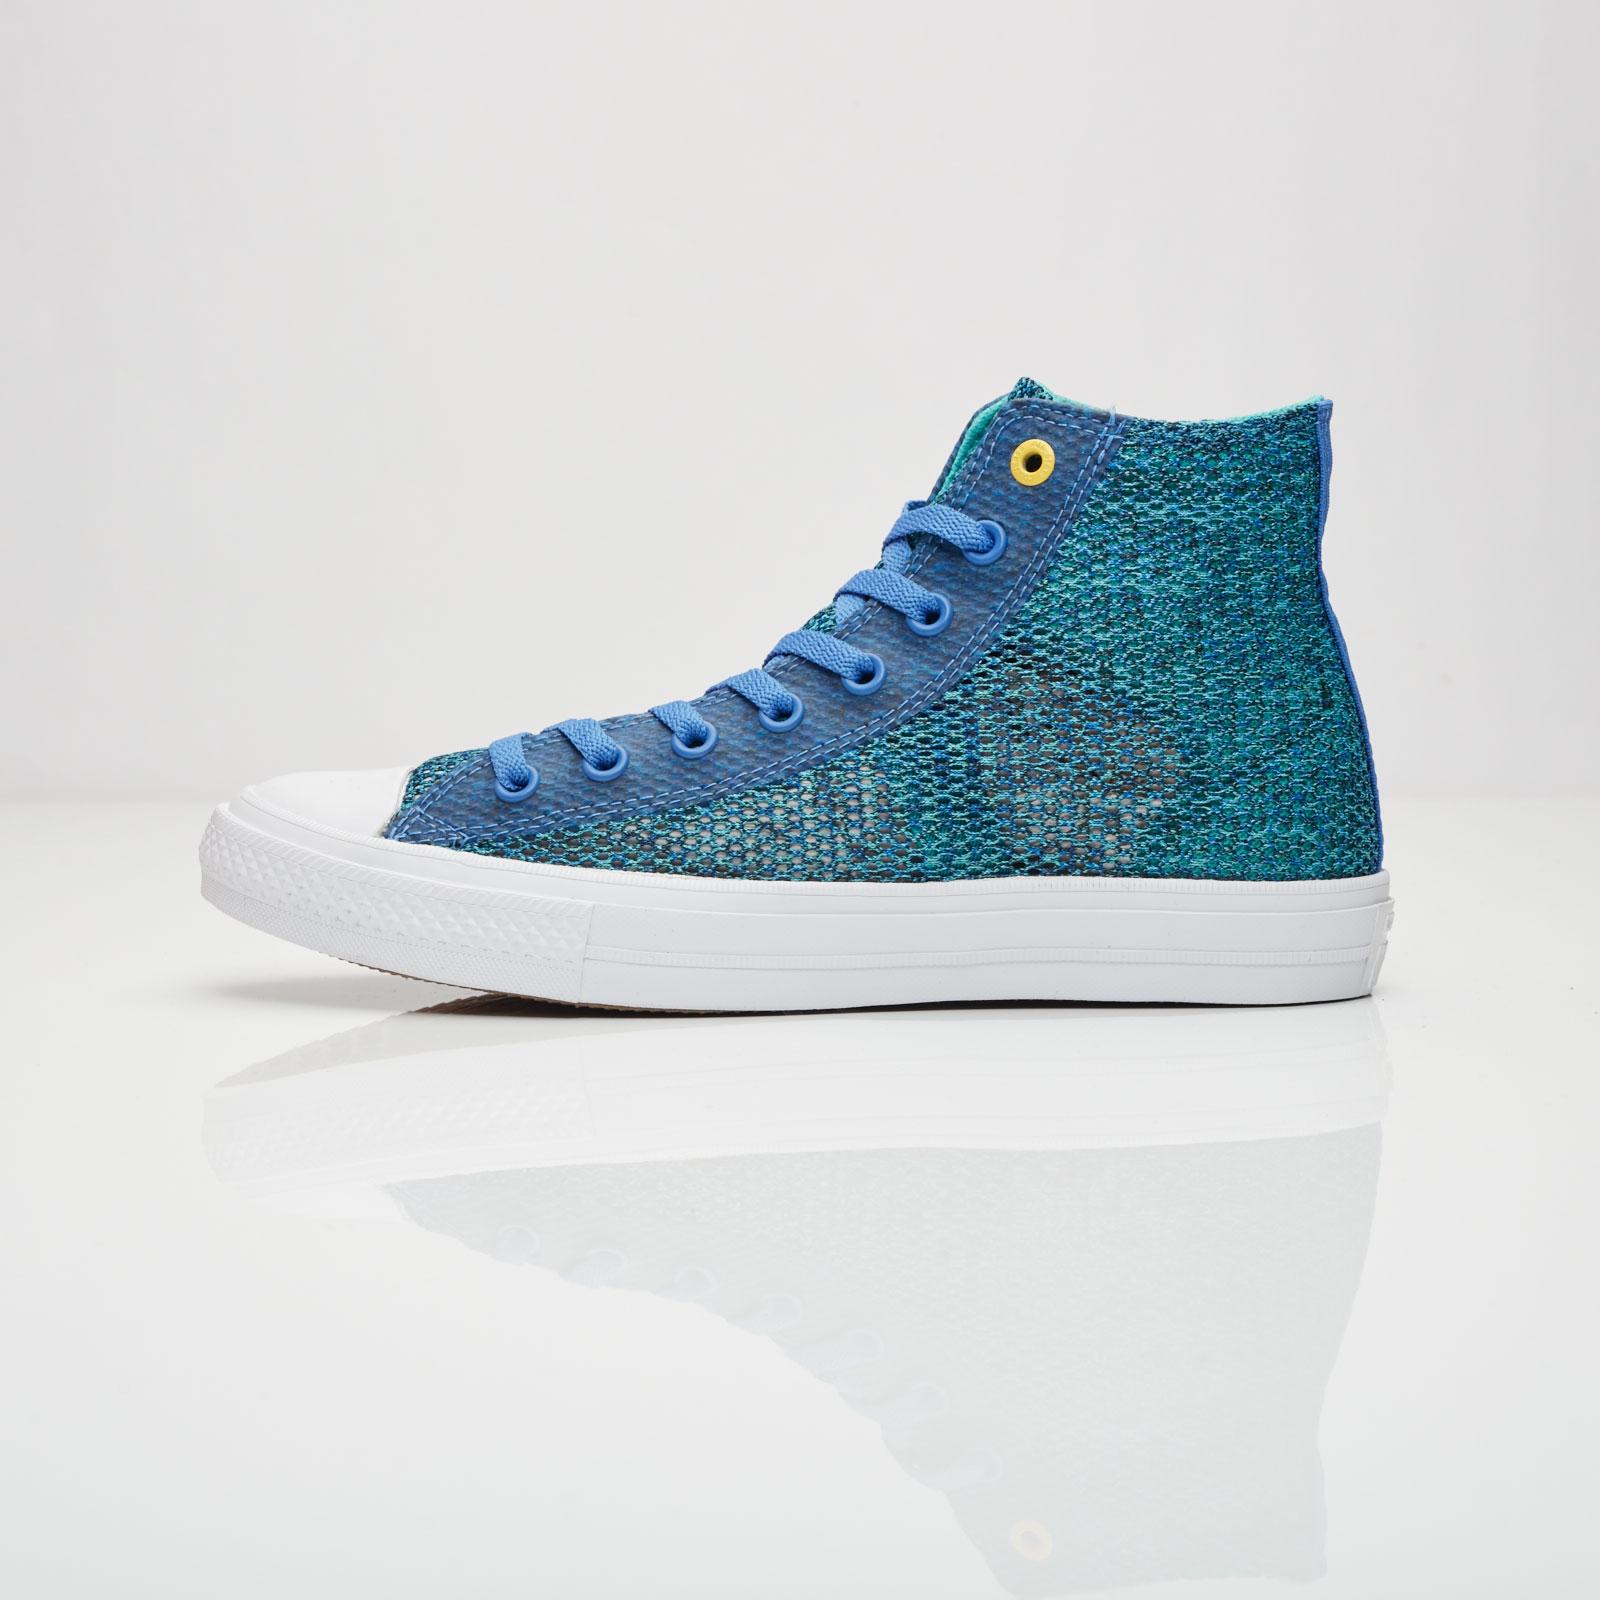 84569b1c0 Converse Chuck Taylor All Star Ii Hi - 154861c - Sneakersnstuff ...